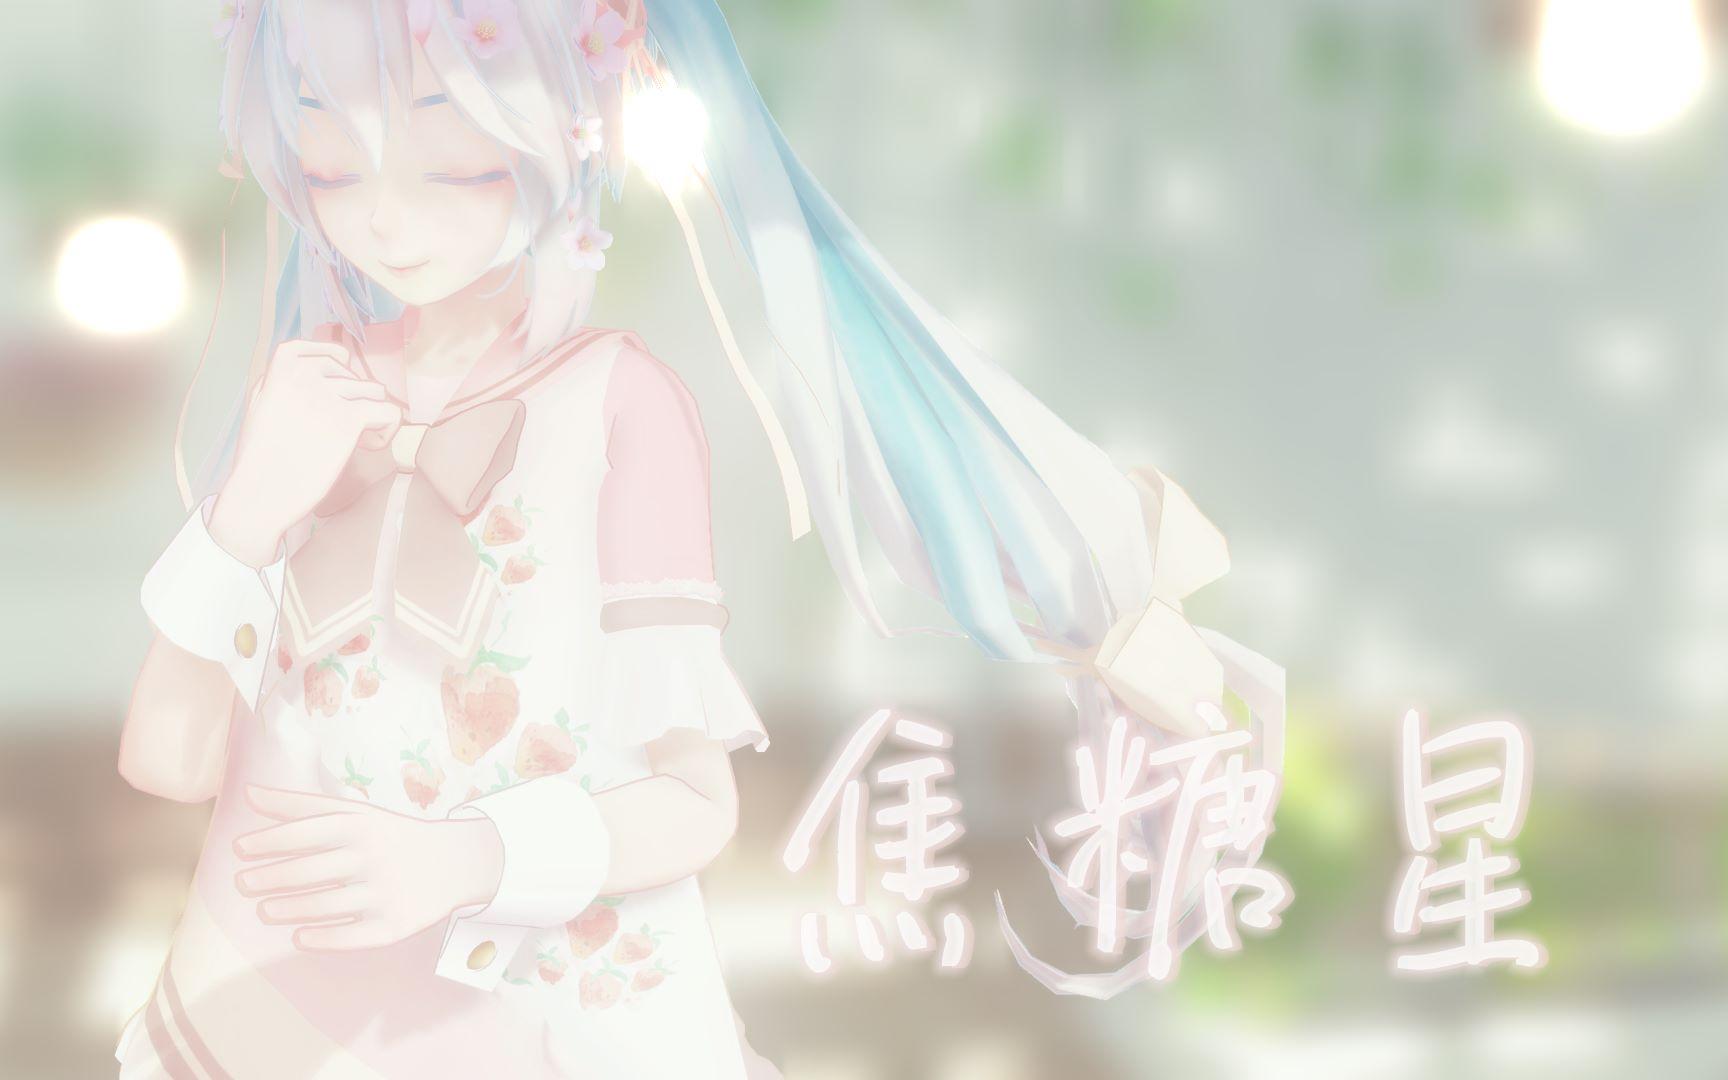 【Miku/MMD/镜头配布】在那灿烂的星空之下,在那焦糖般苦涩的回忆里《カラメルスターズ》